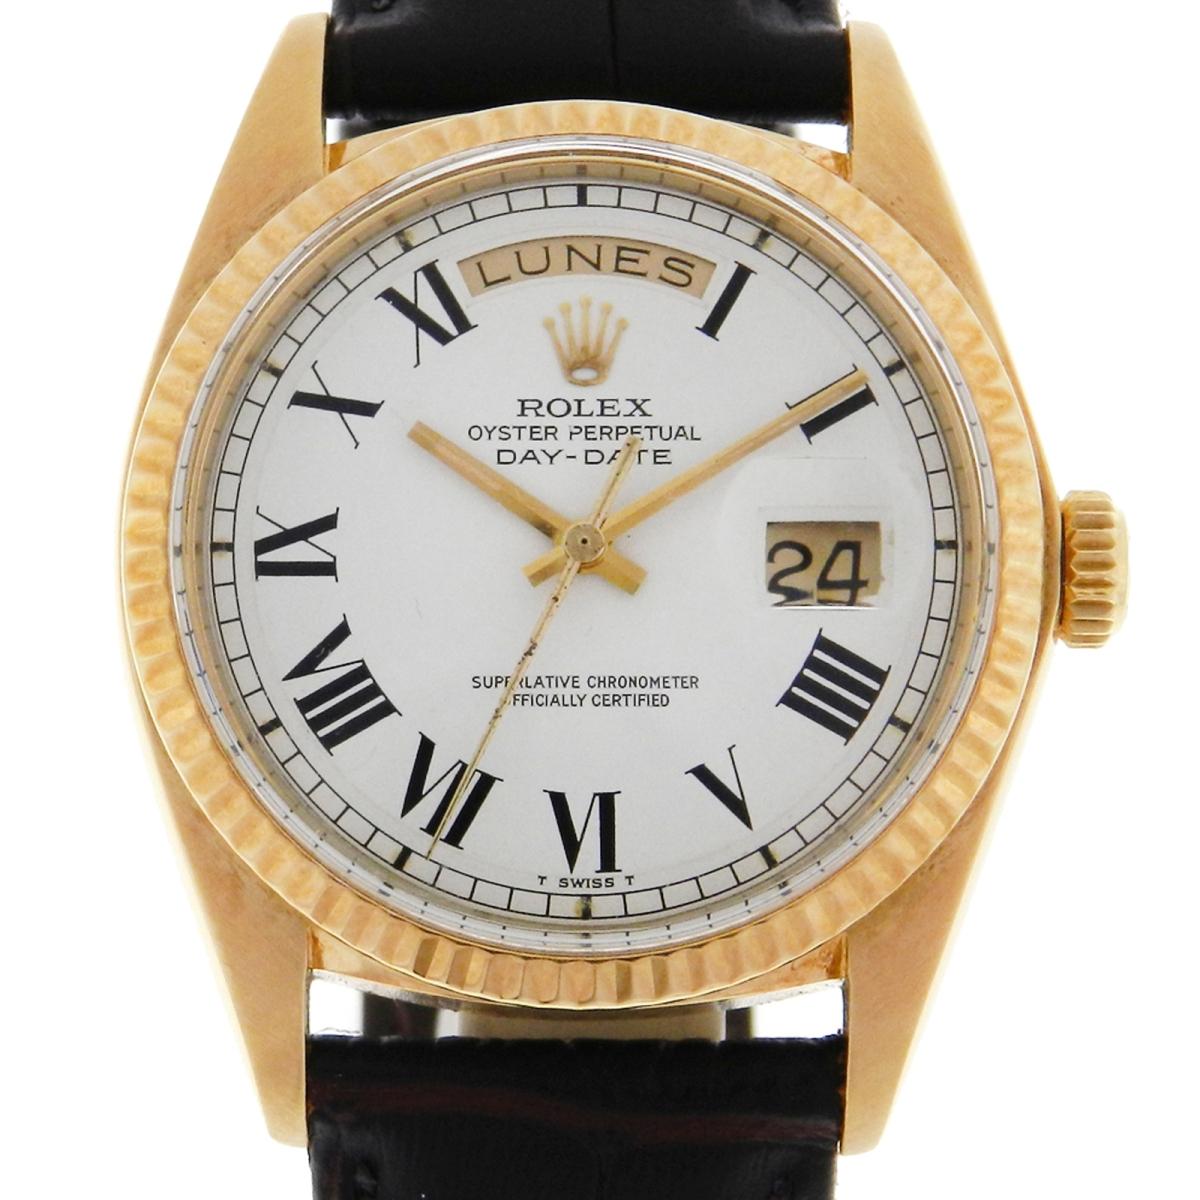 9462cf4b01f Relógio Rolex Day-Date Oyster Presidente - Referencia 1